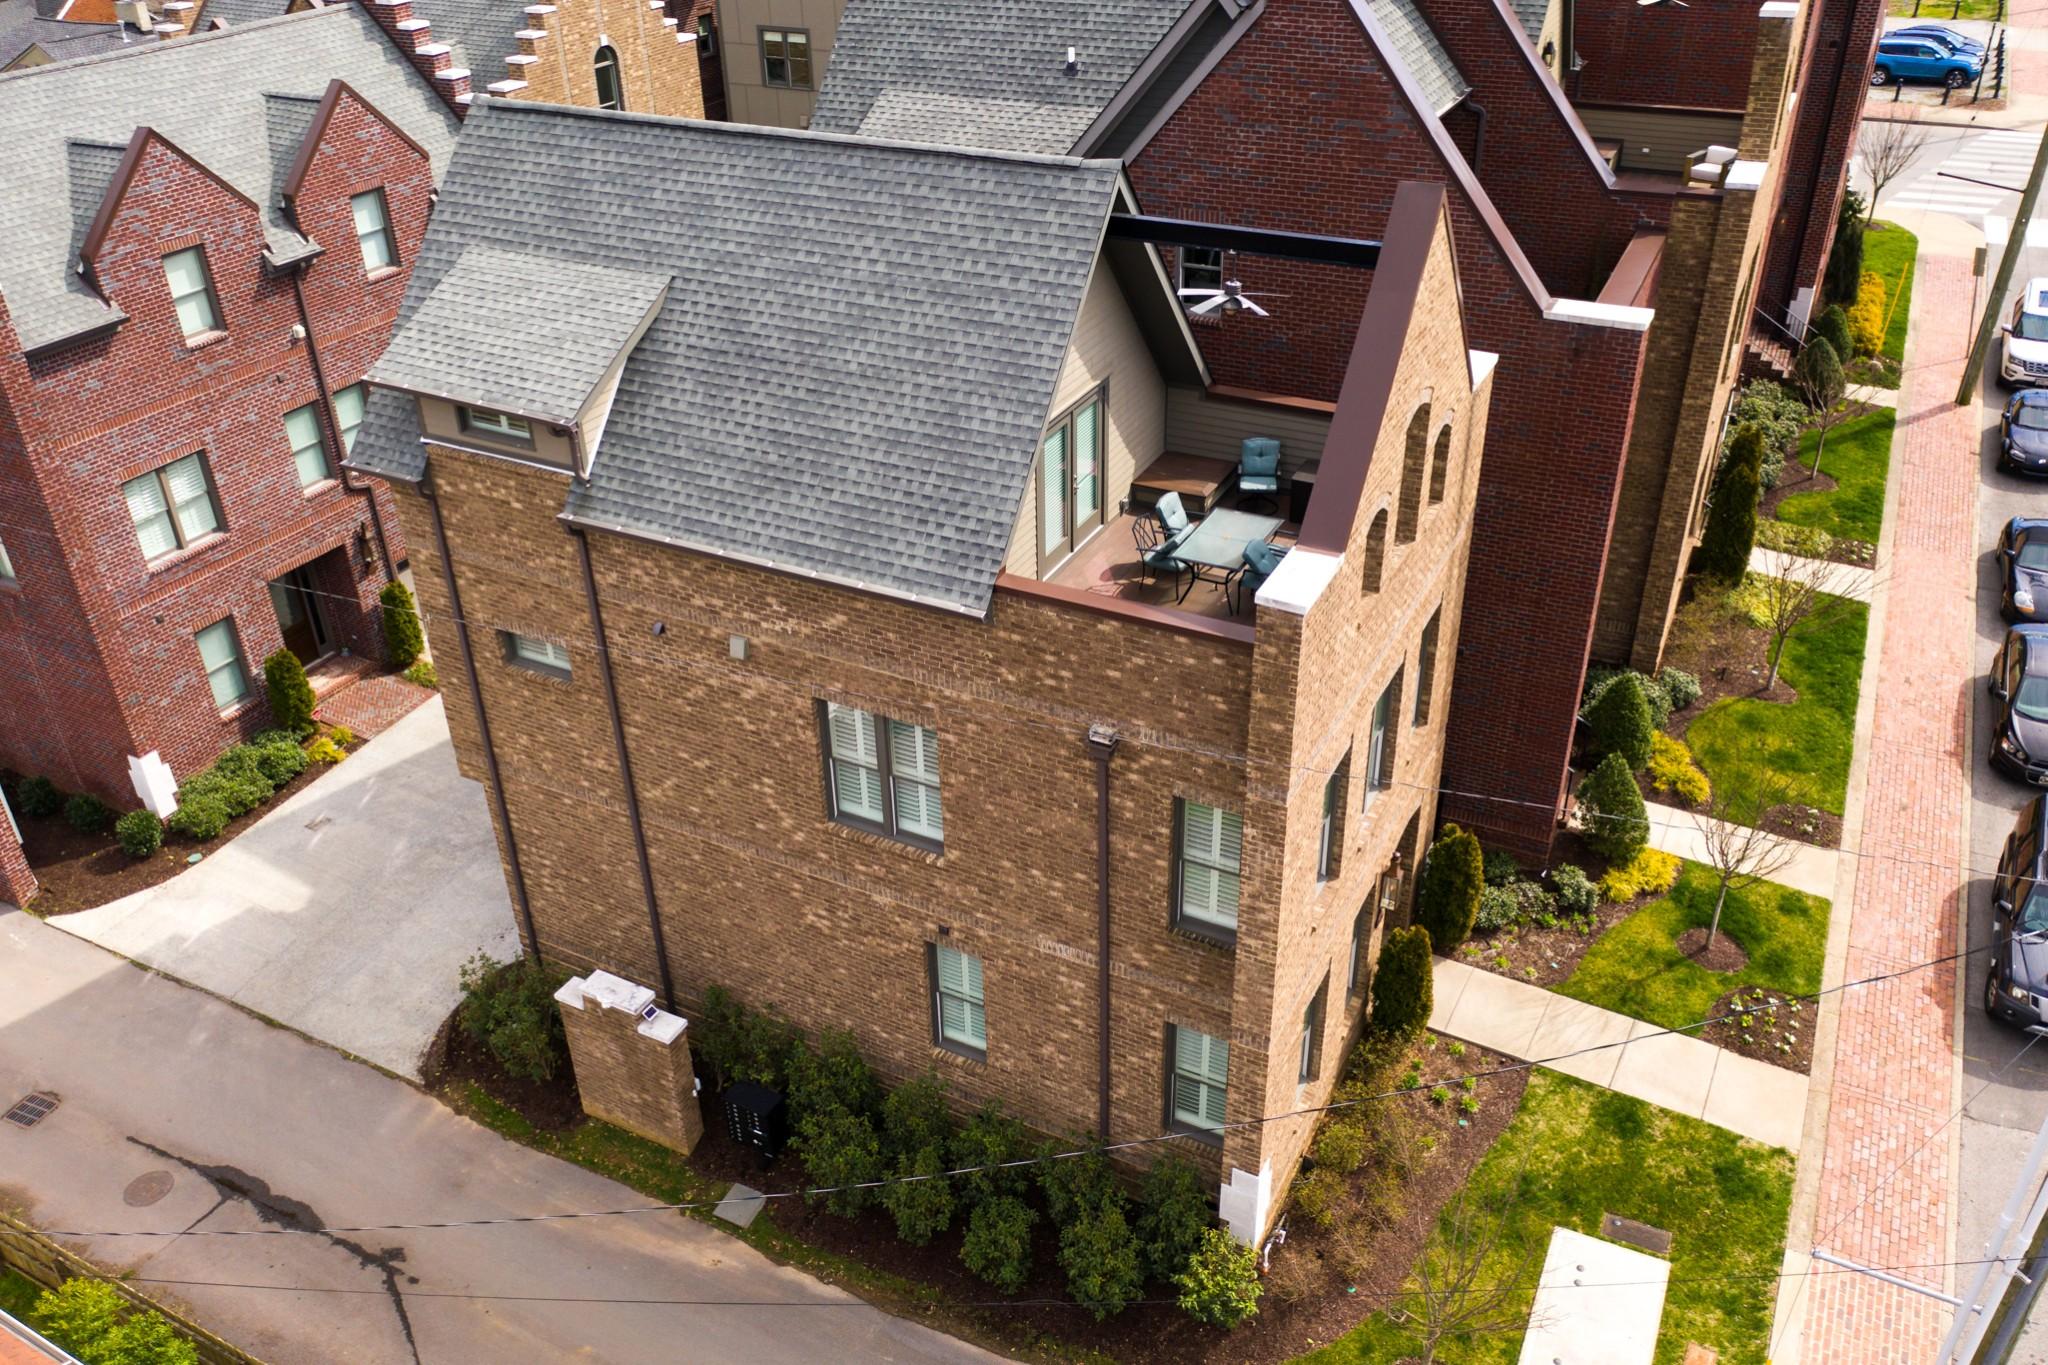 1304A 7th Ave, N, Nashville, TN 37208 - Nashville, TN real estate listing